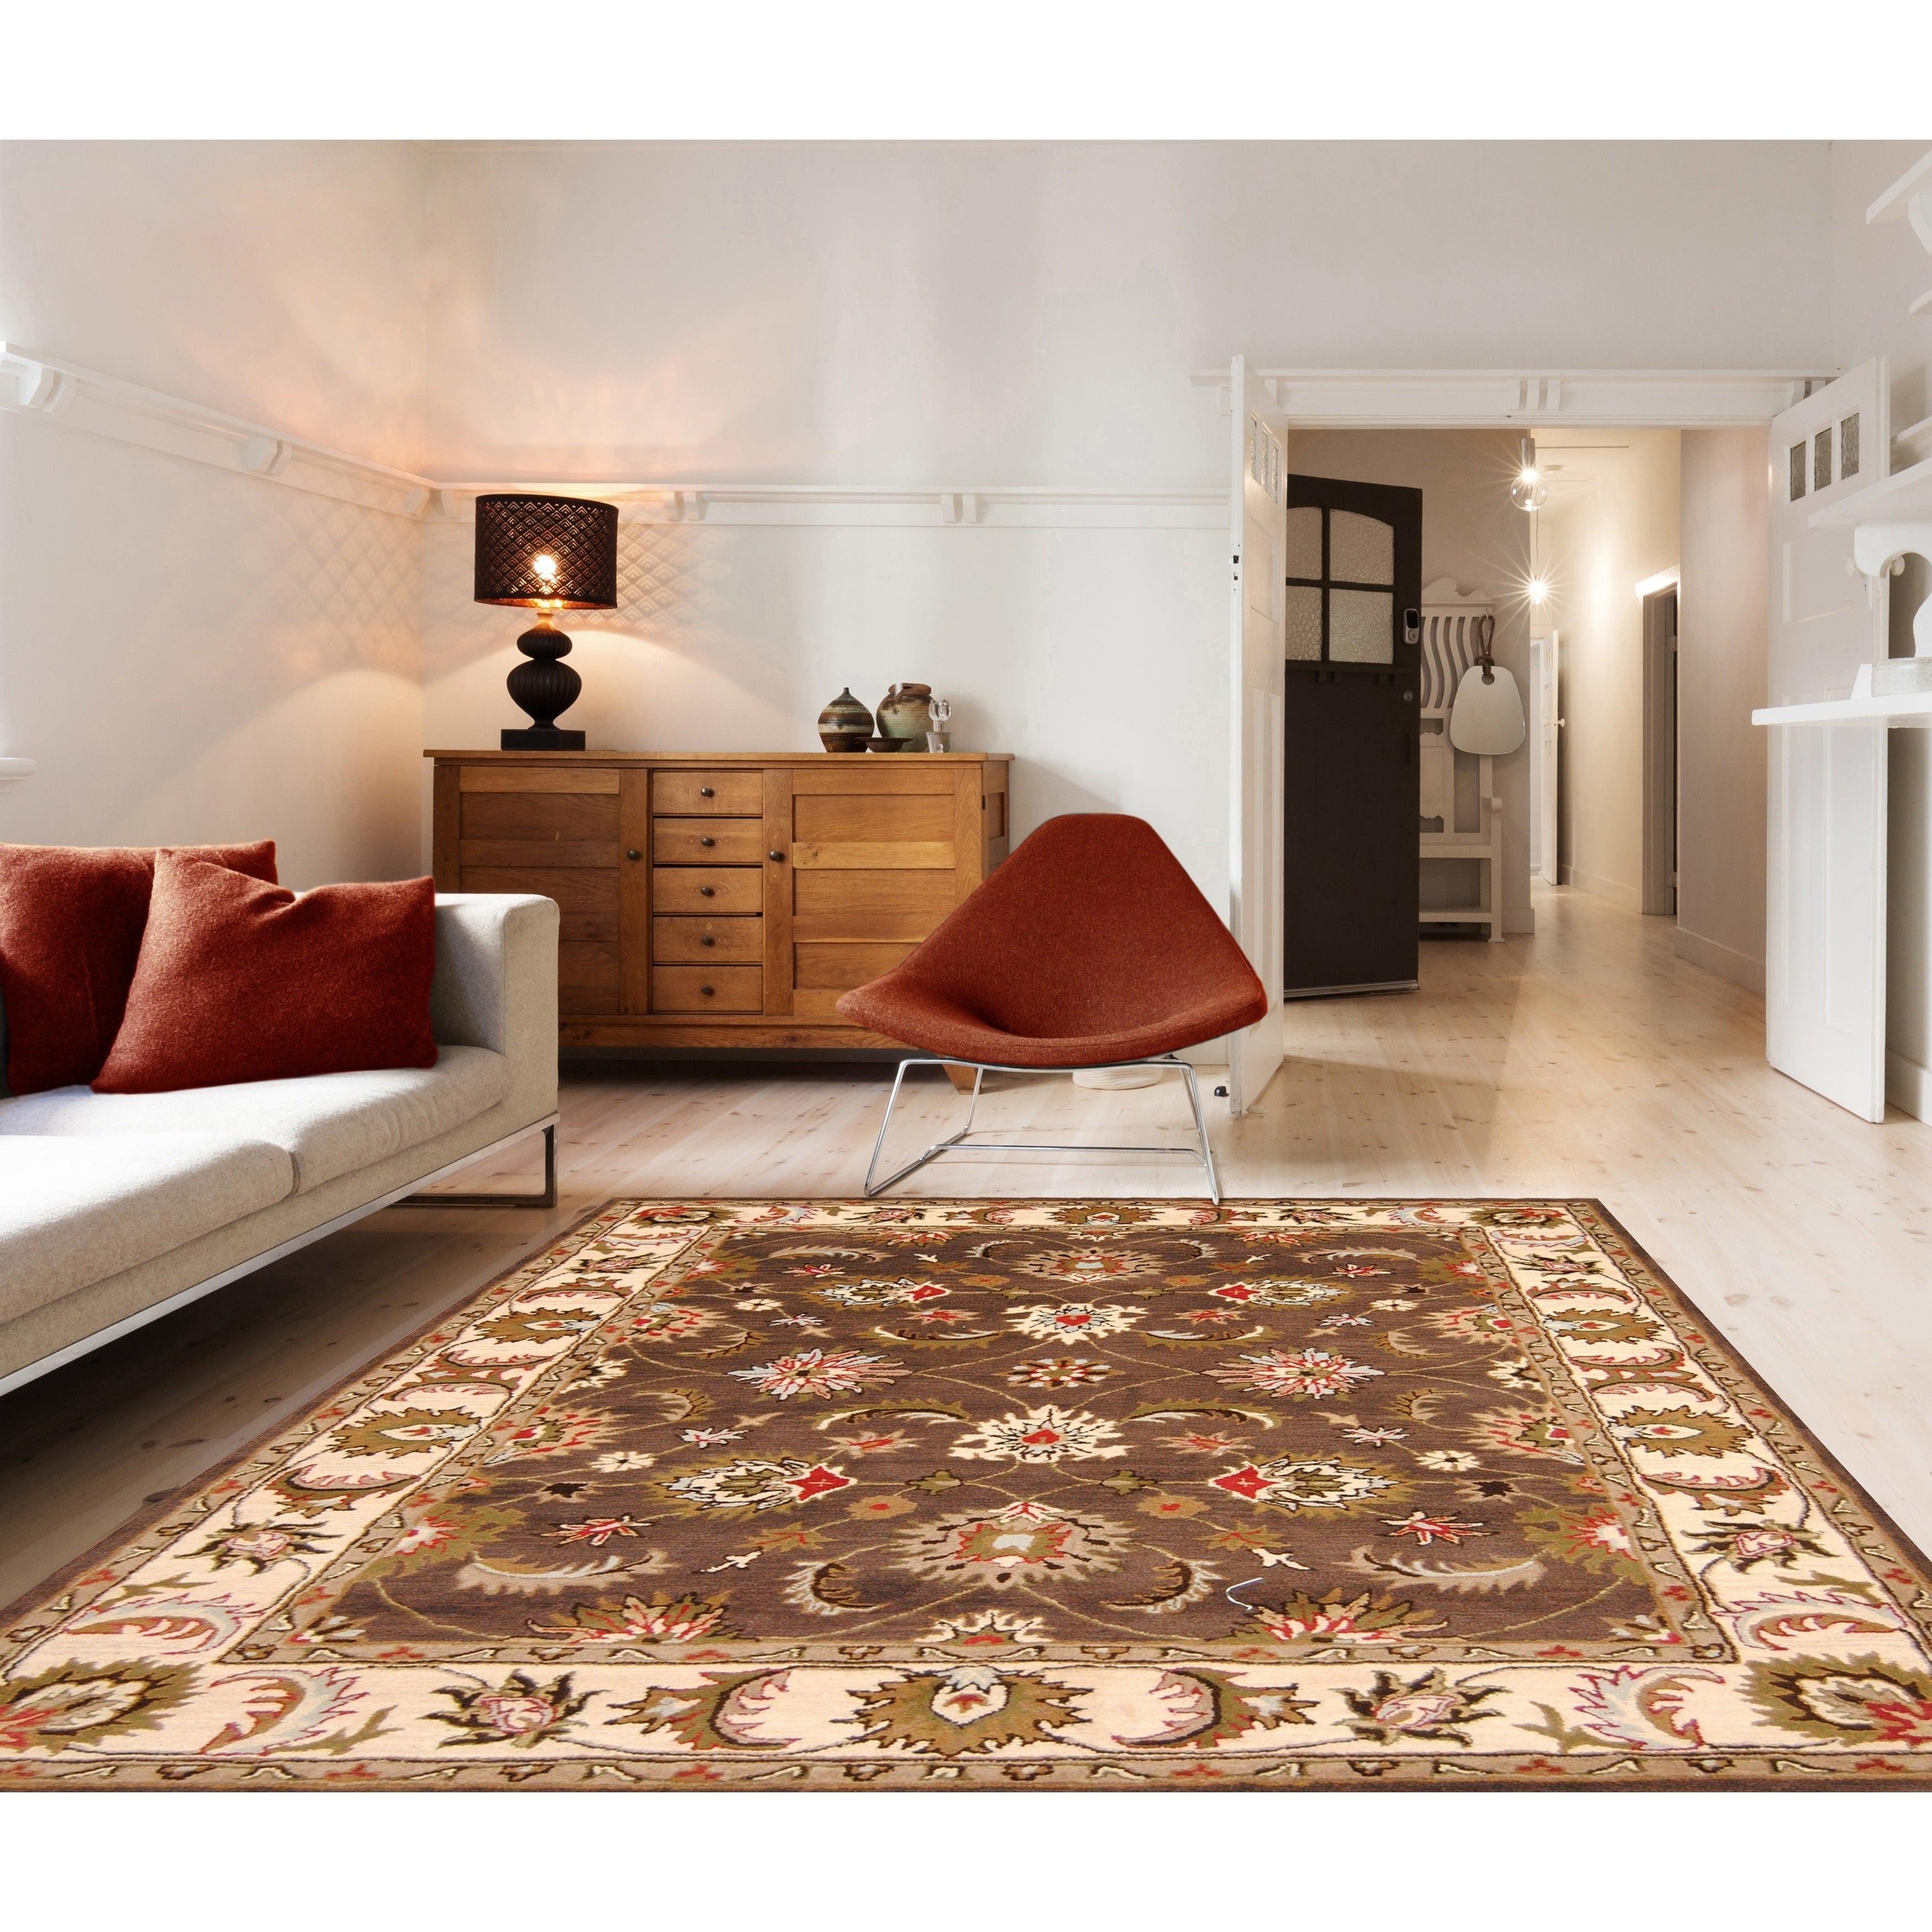 Handmade Herat Oriental Indo Isfahan Wool Rug (India) - 8 x 10 (Brown/Ivory - 8 x 10)